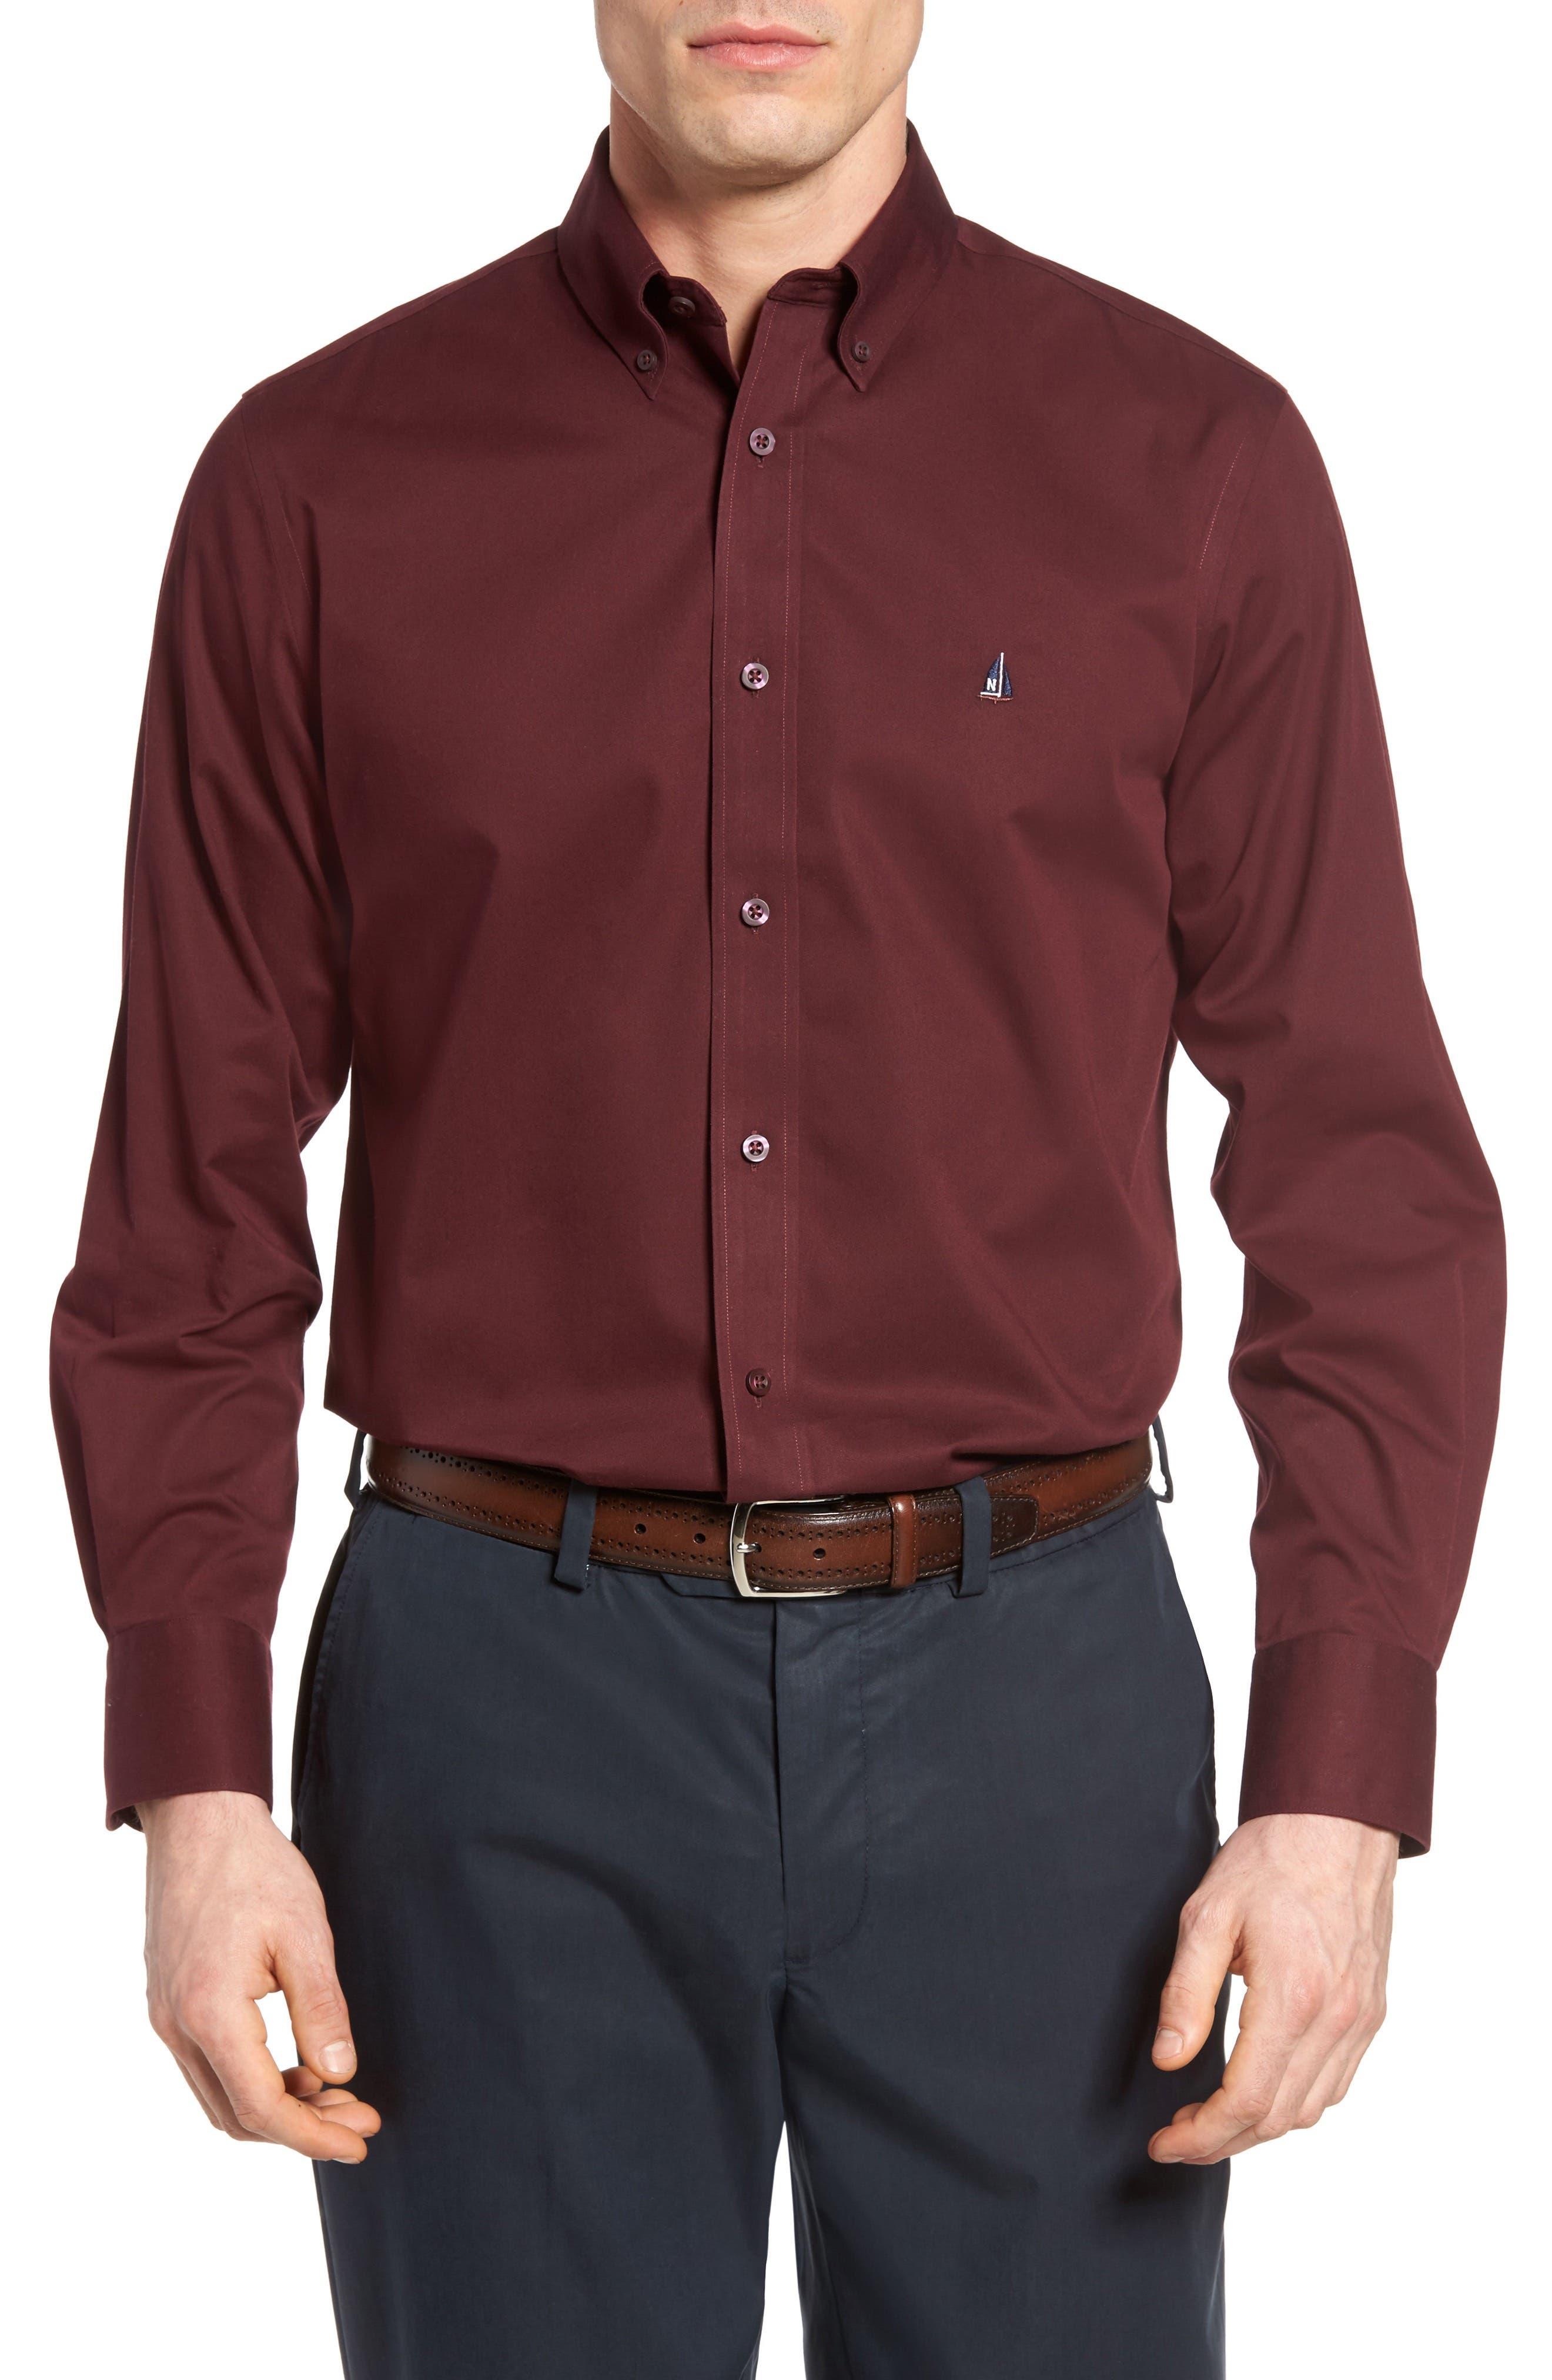 NORDSTROM MEN'S SHOP Smartcare<sup>™</sup> Traditional Fit Twill Boat Shirt, Main, color, BURGUNDY ROYALE